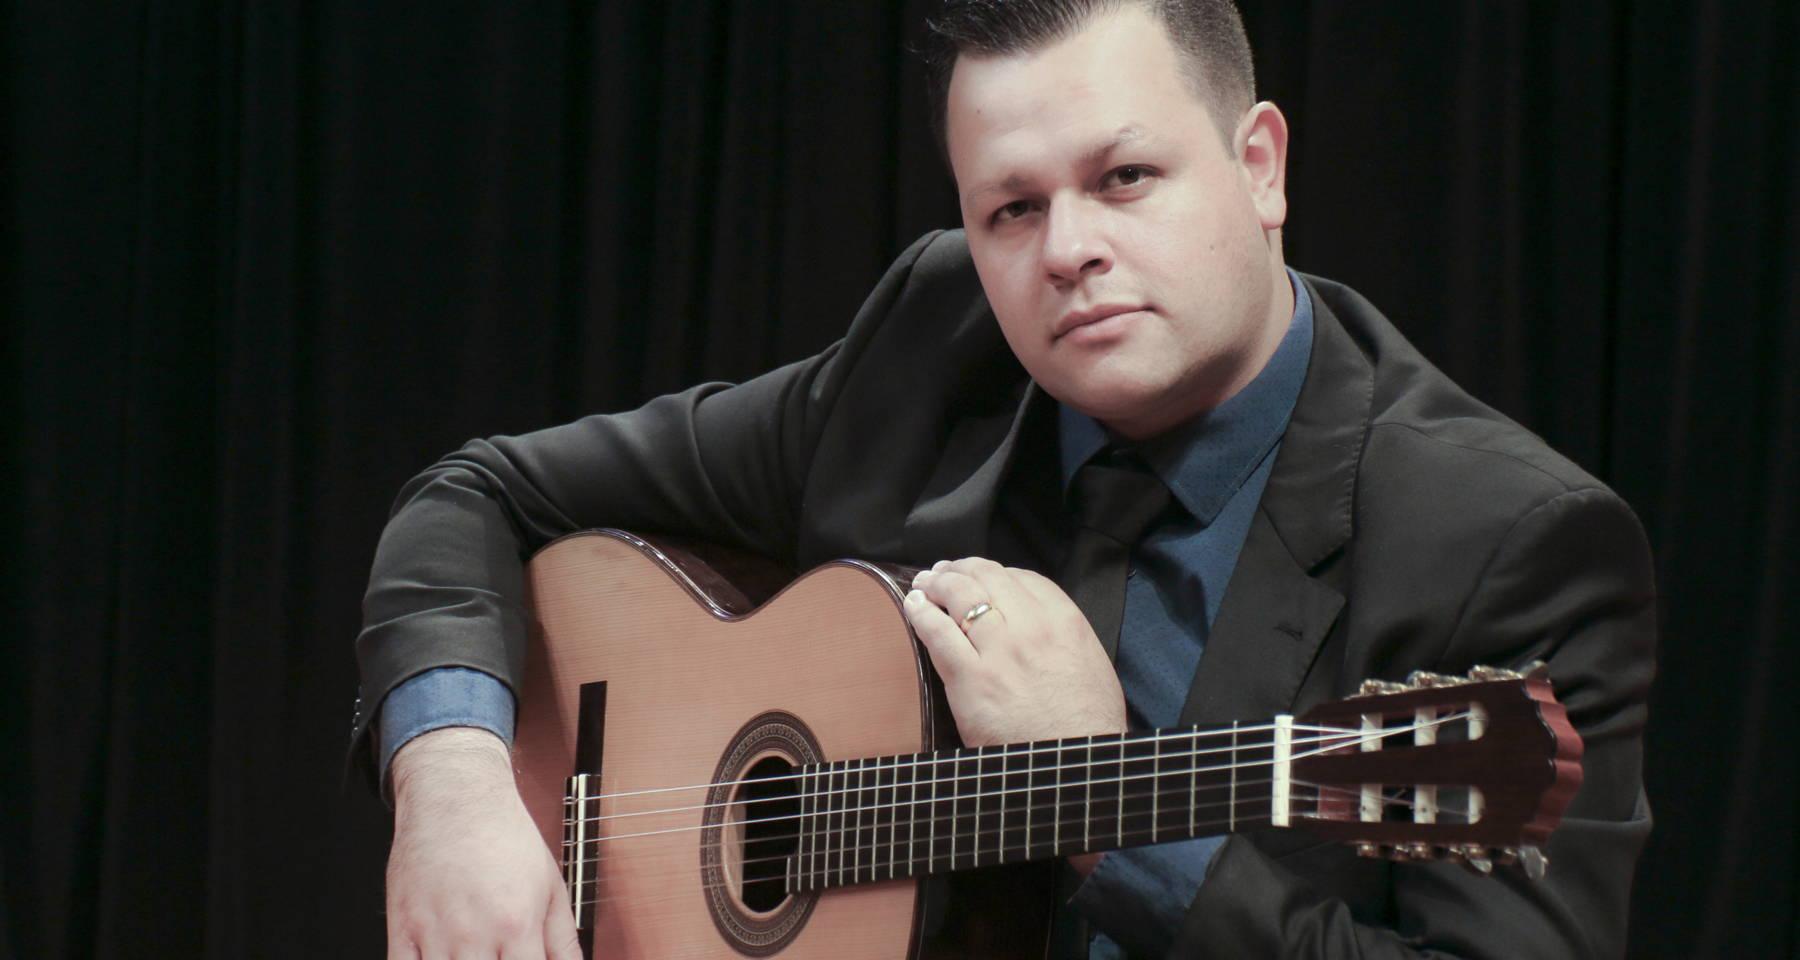 Classical Guitar Concert by Walmor Boza